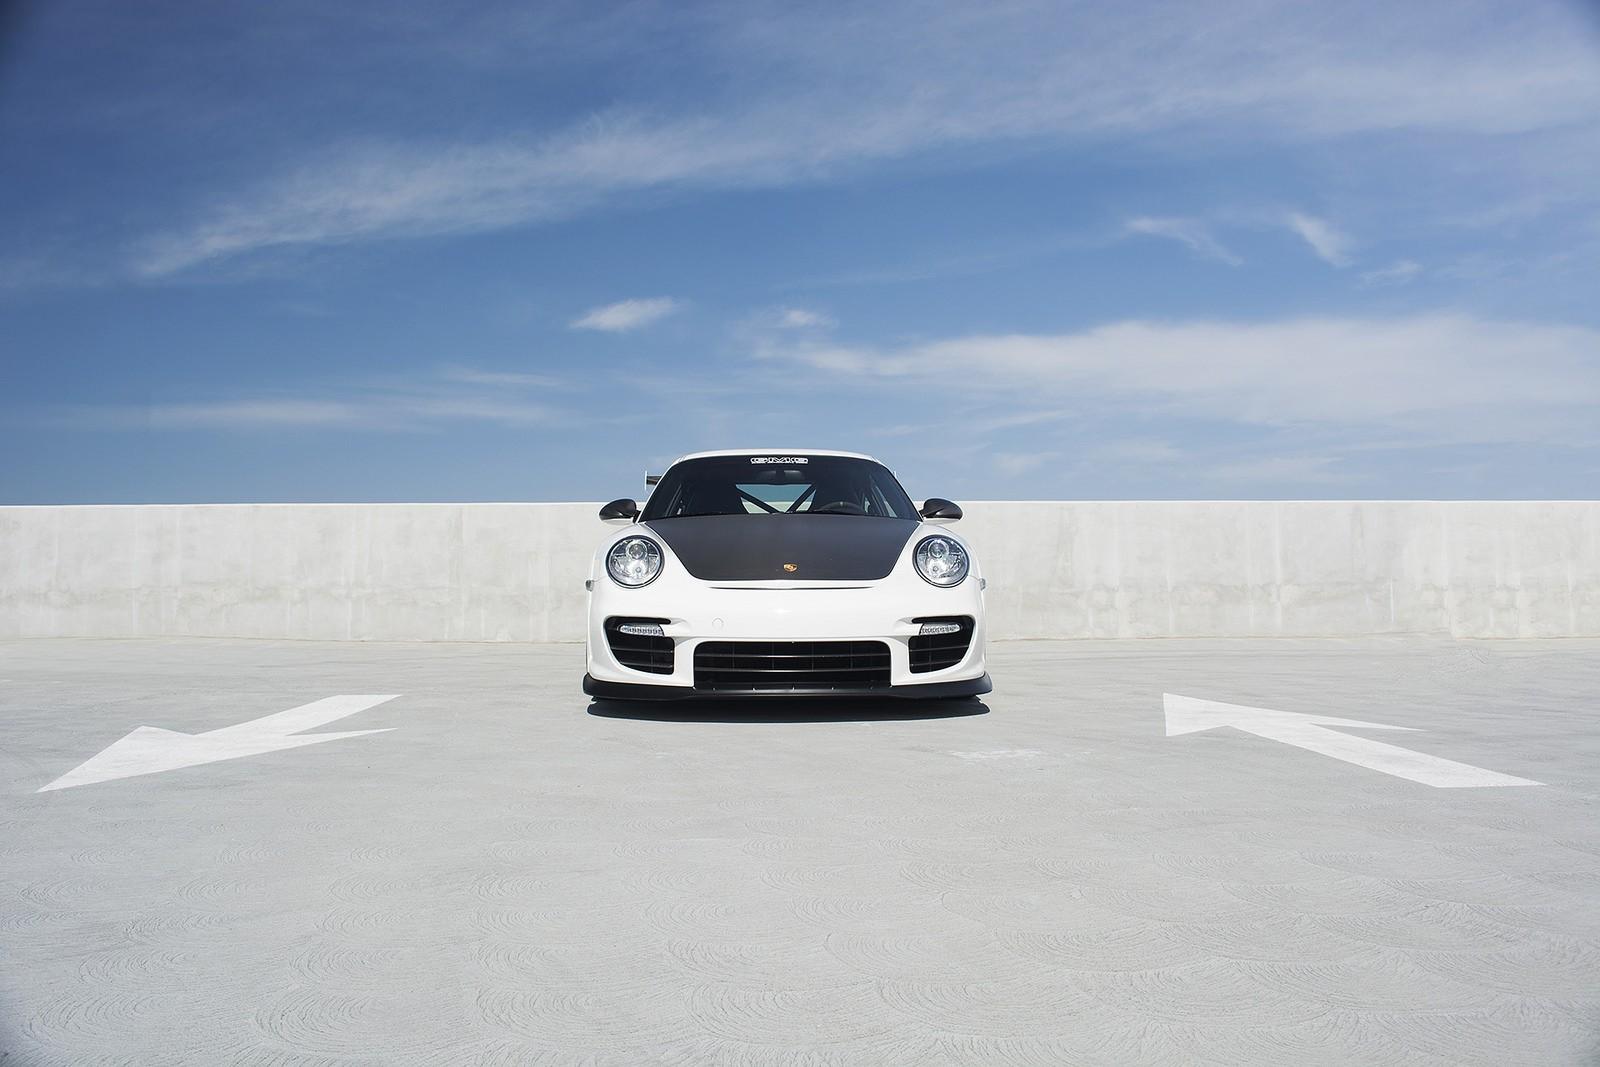 porsche 911 gt2 rs drag race unpredicatable porsche gt2 rs vs gt3 rs drag race porsche gt2. Black Bedroom Furniture Sets. Home Design Ideas